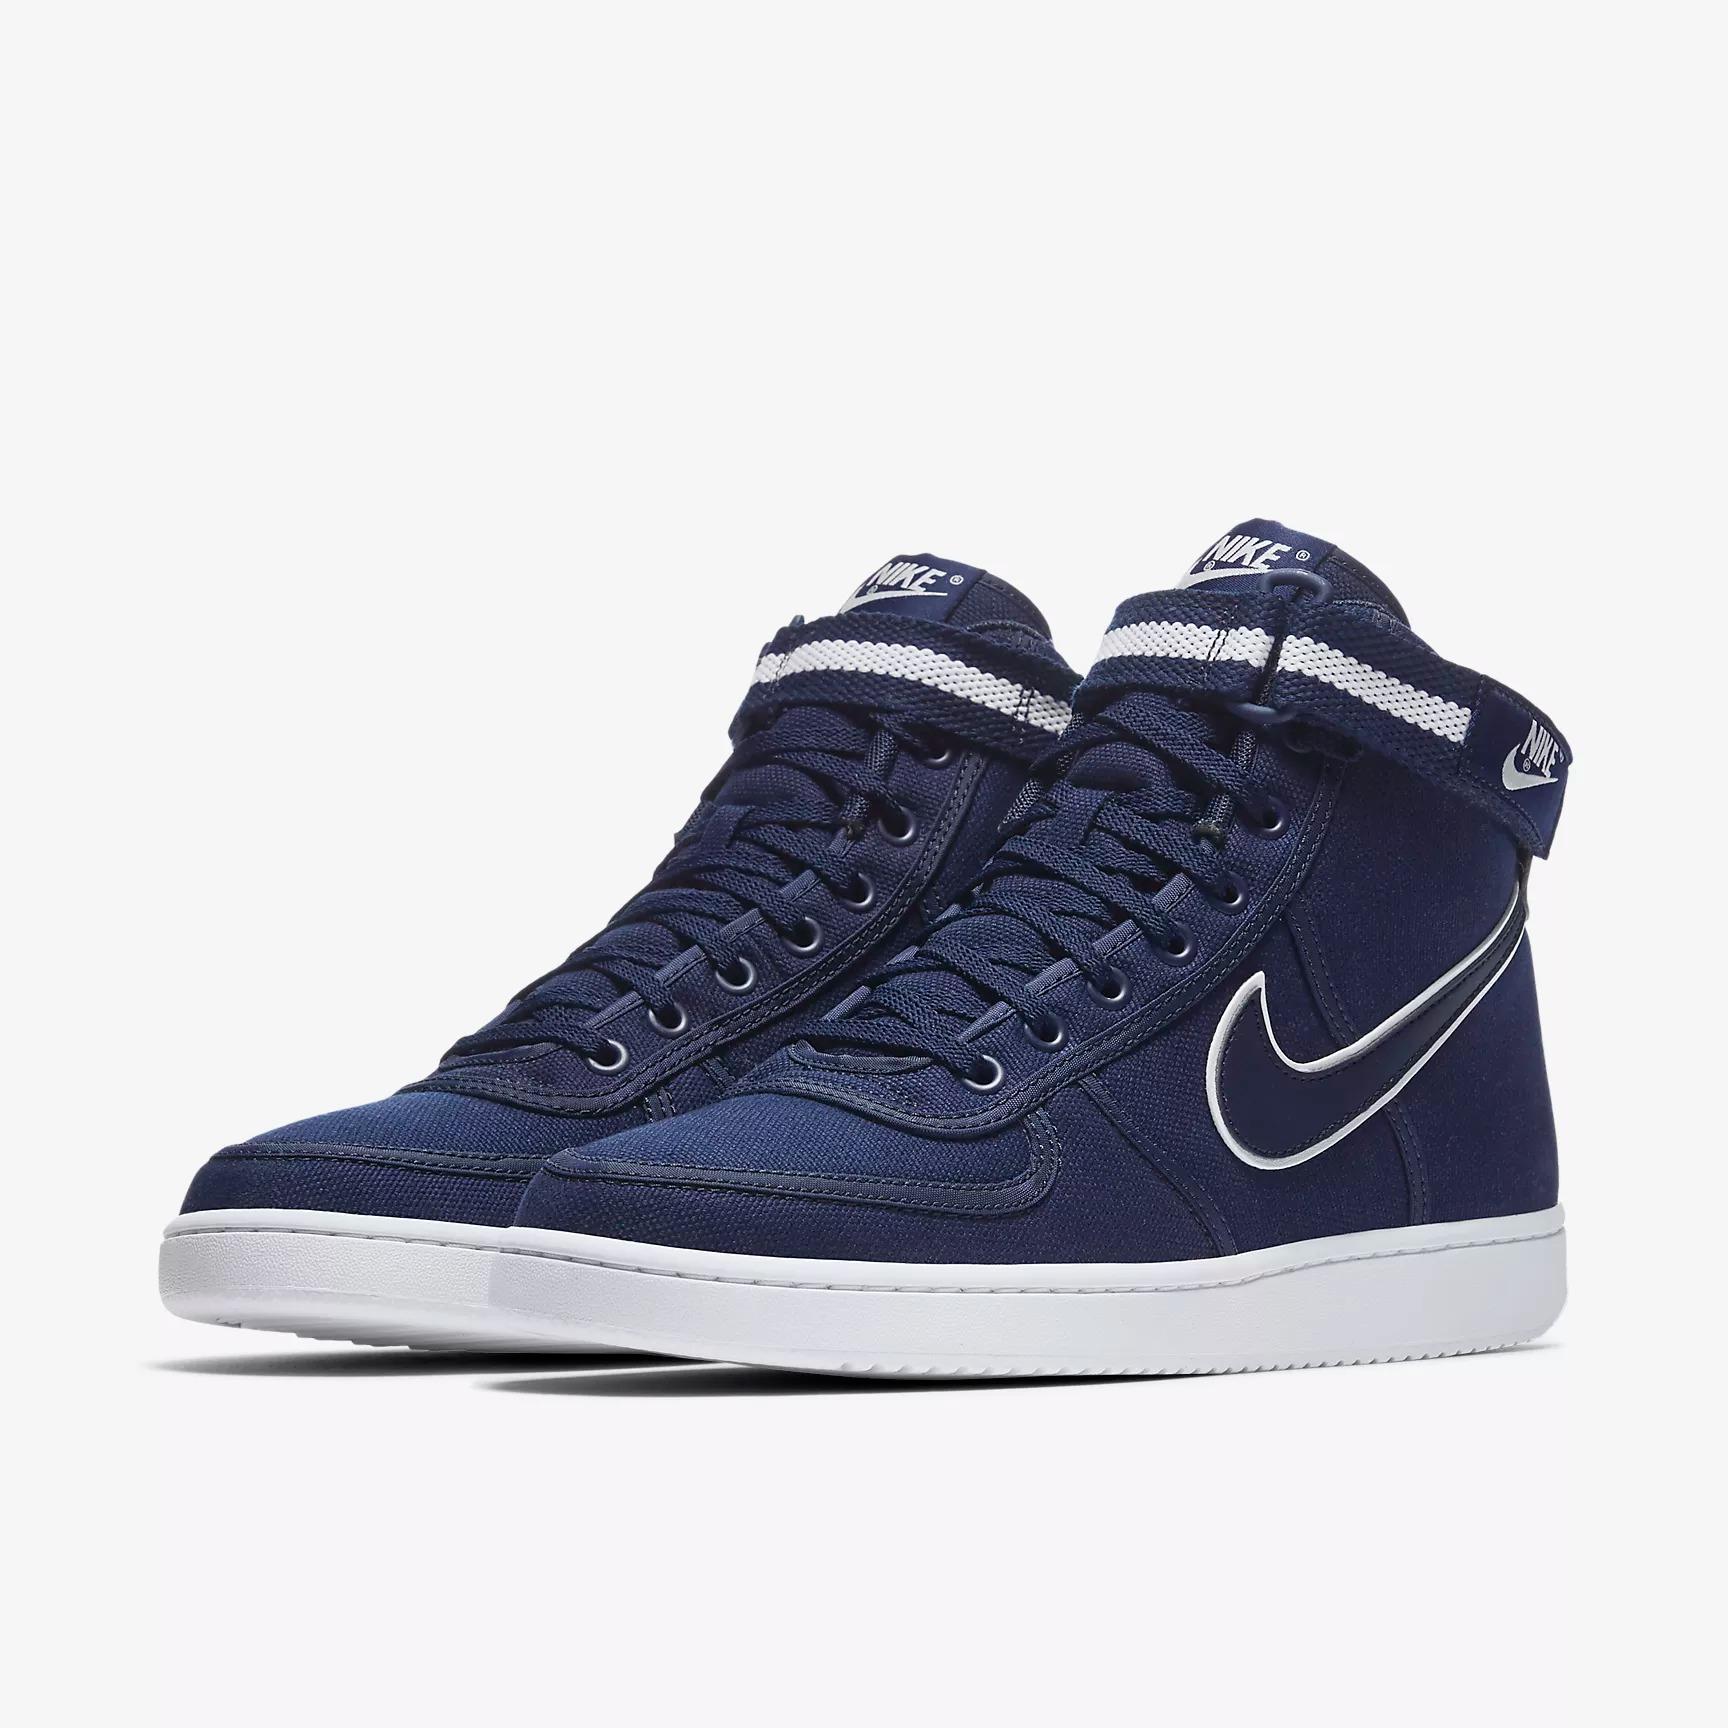 Nike Supreme Majestic Shoes